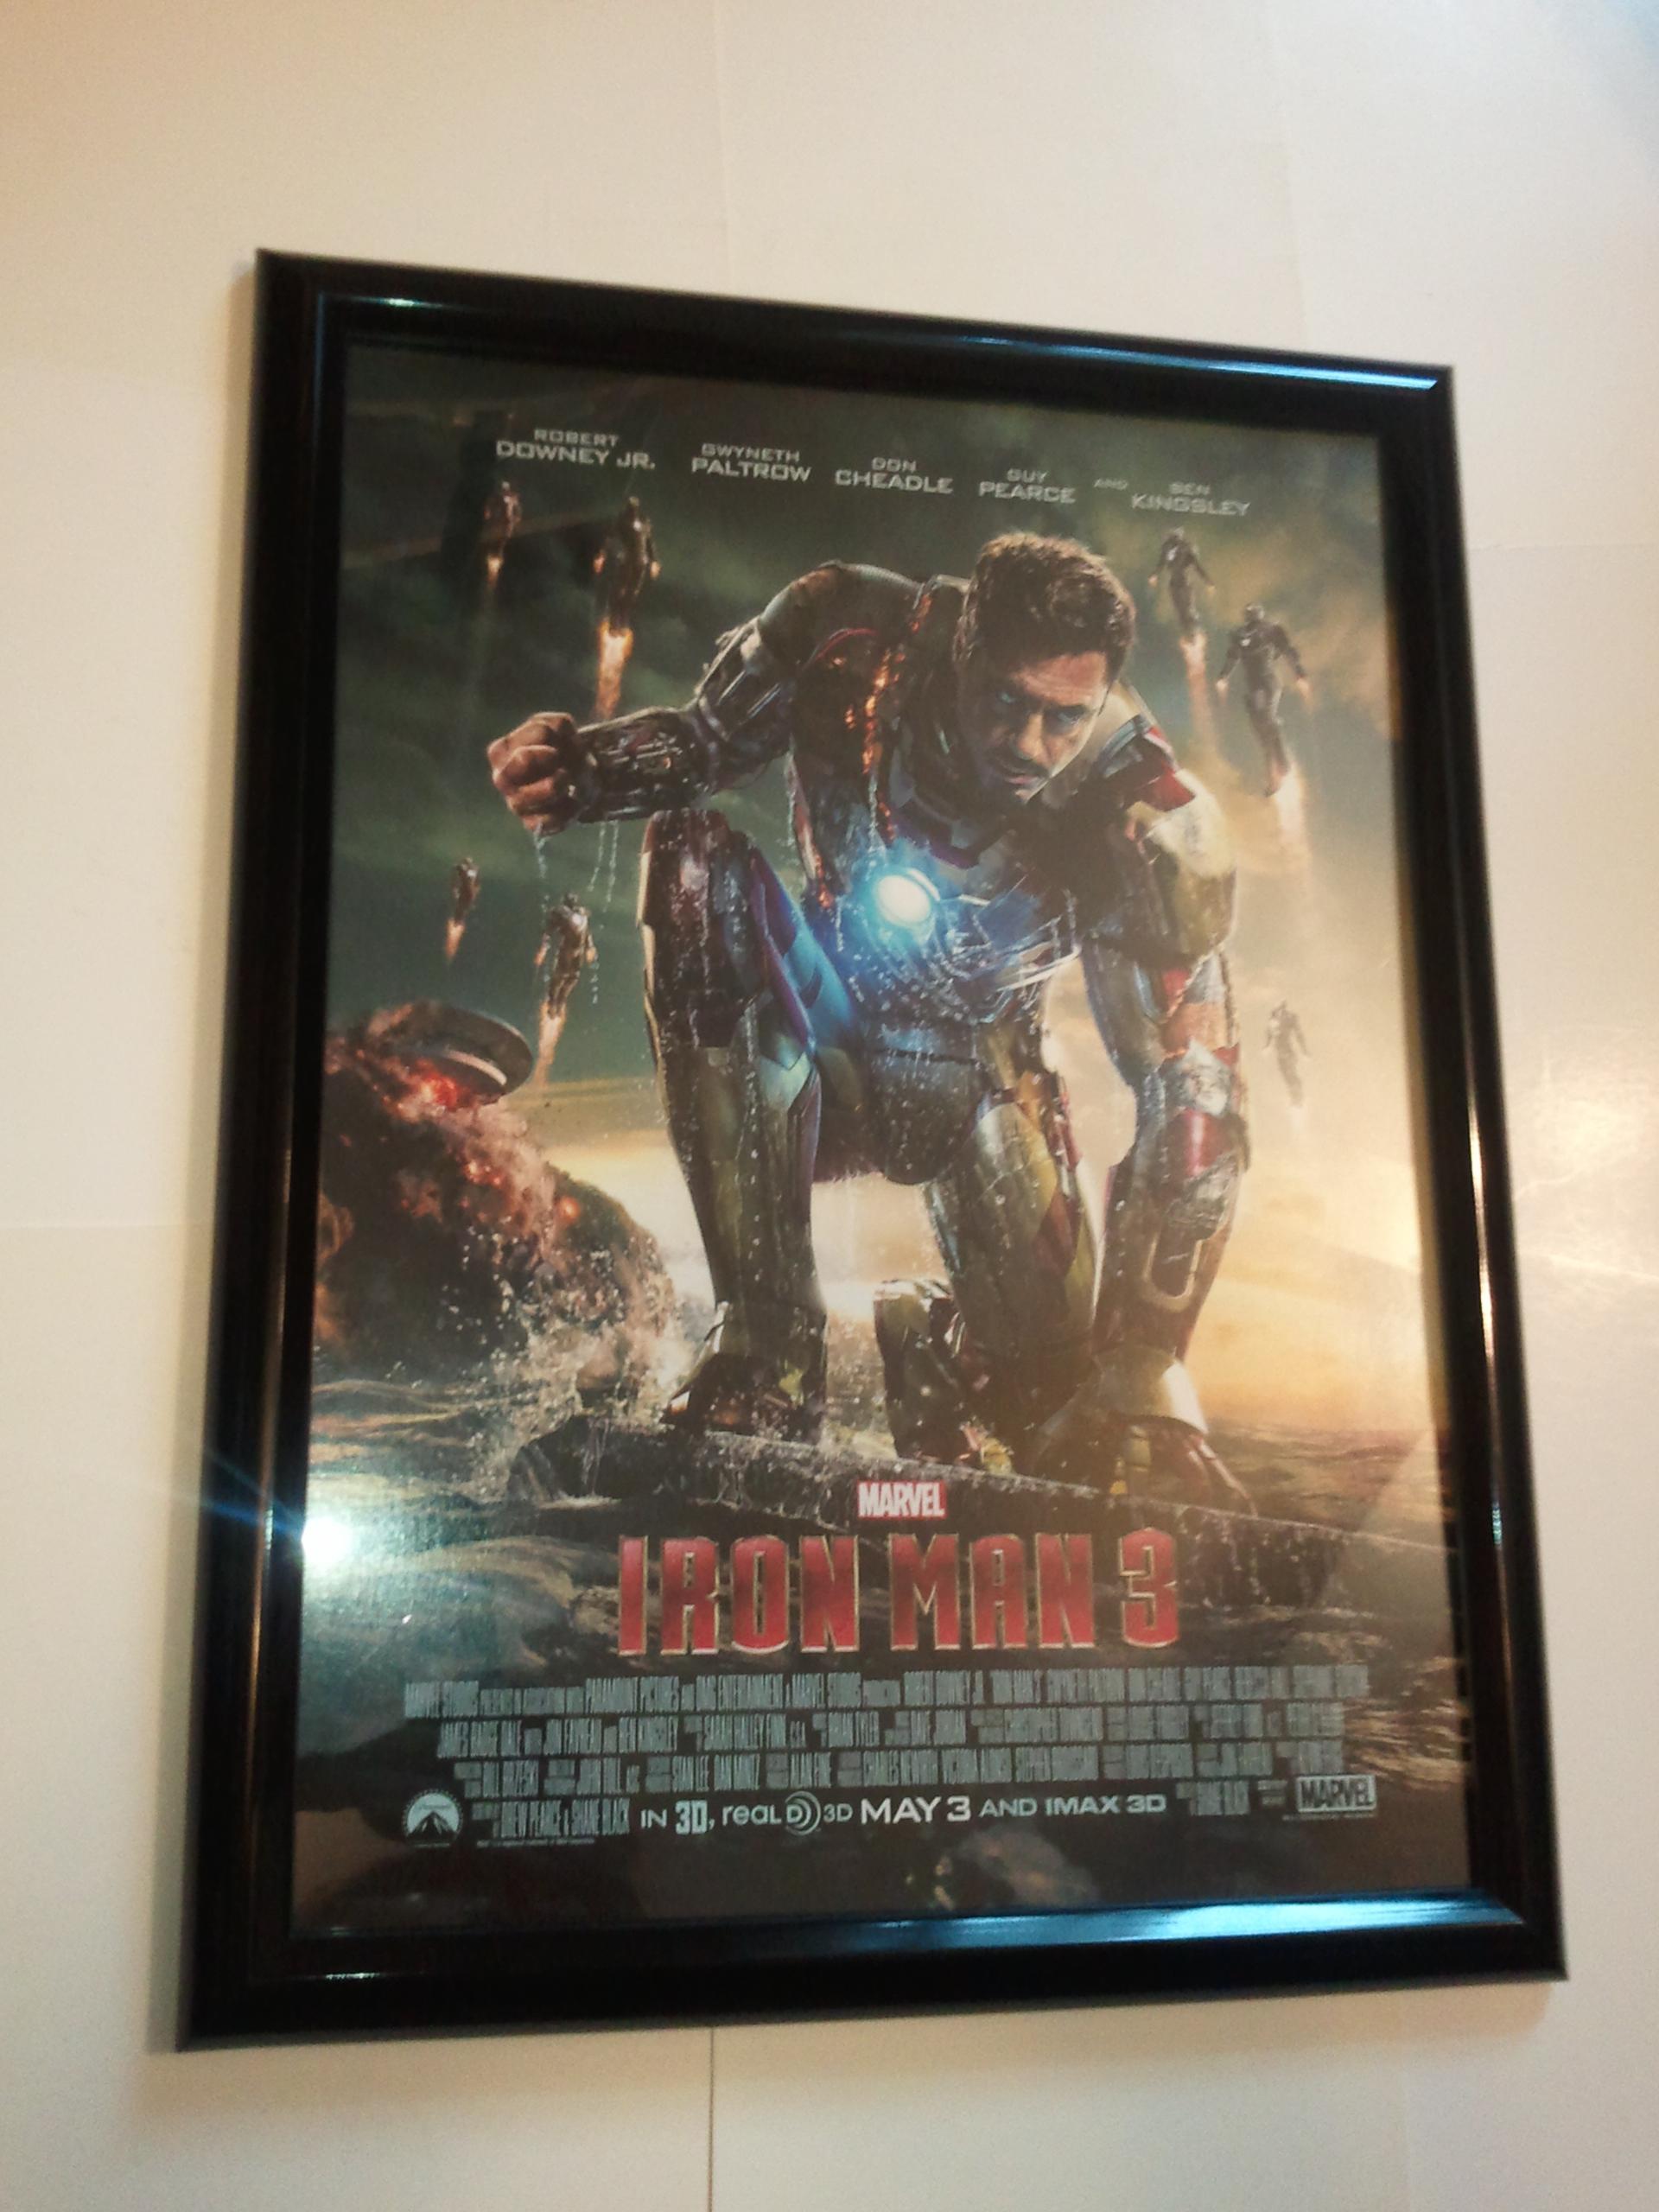 kunstplakate 24x36 iron man 3 movie